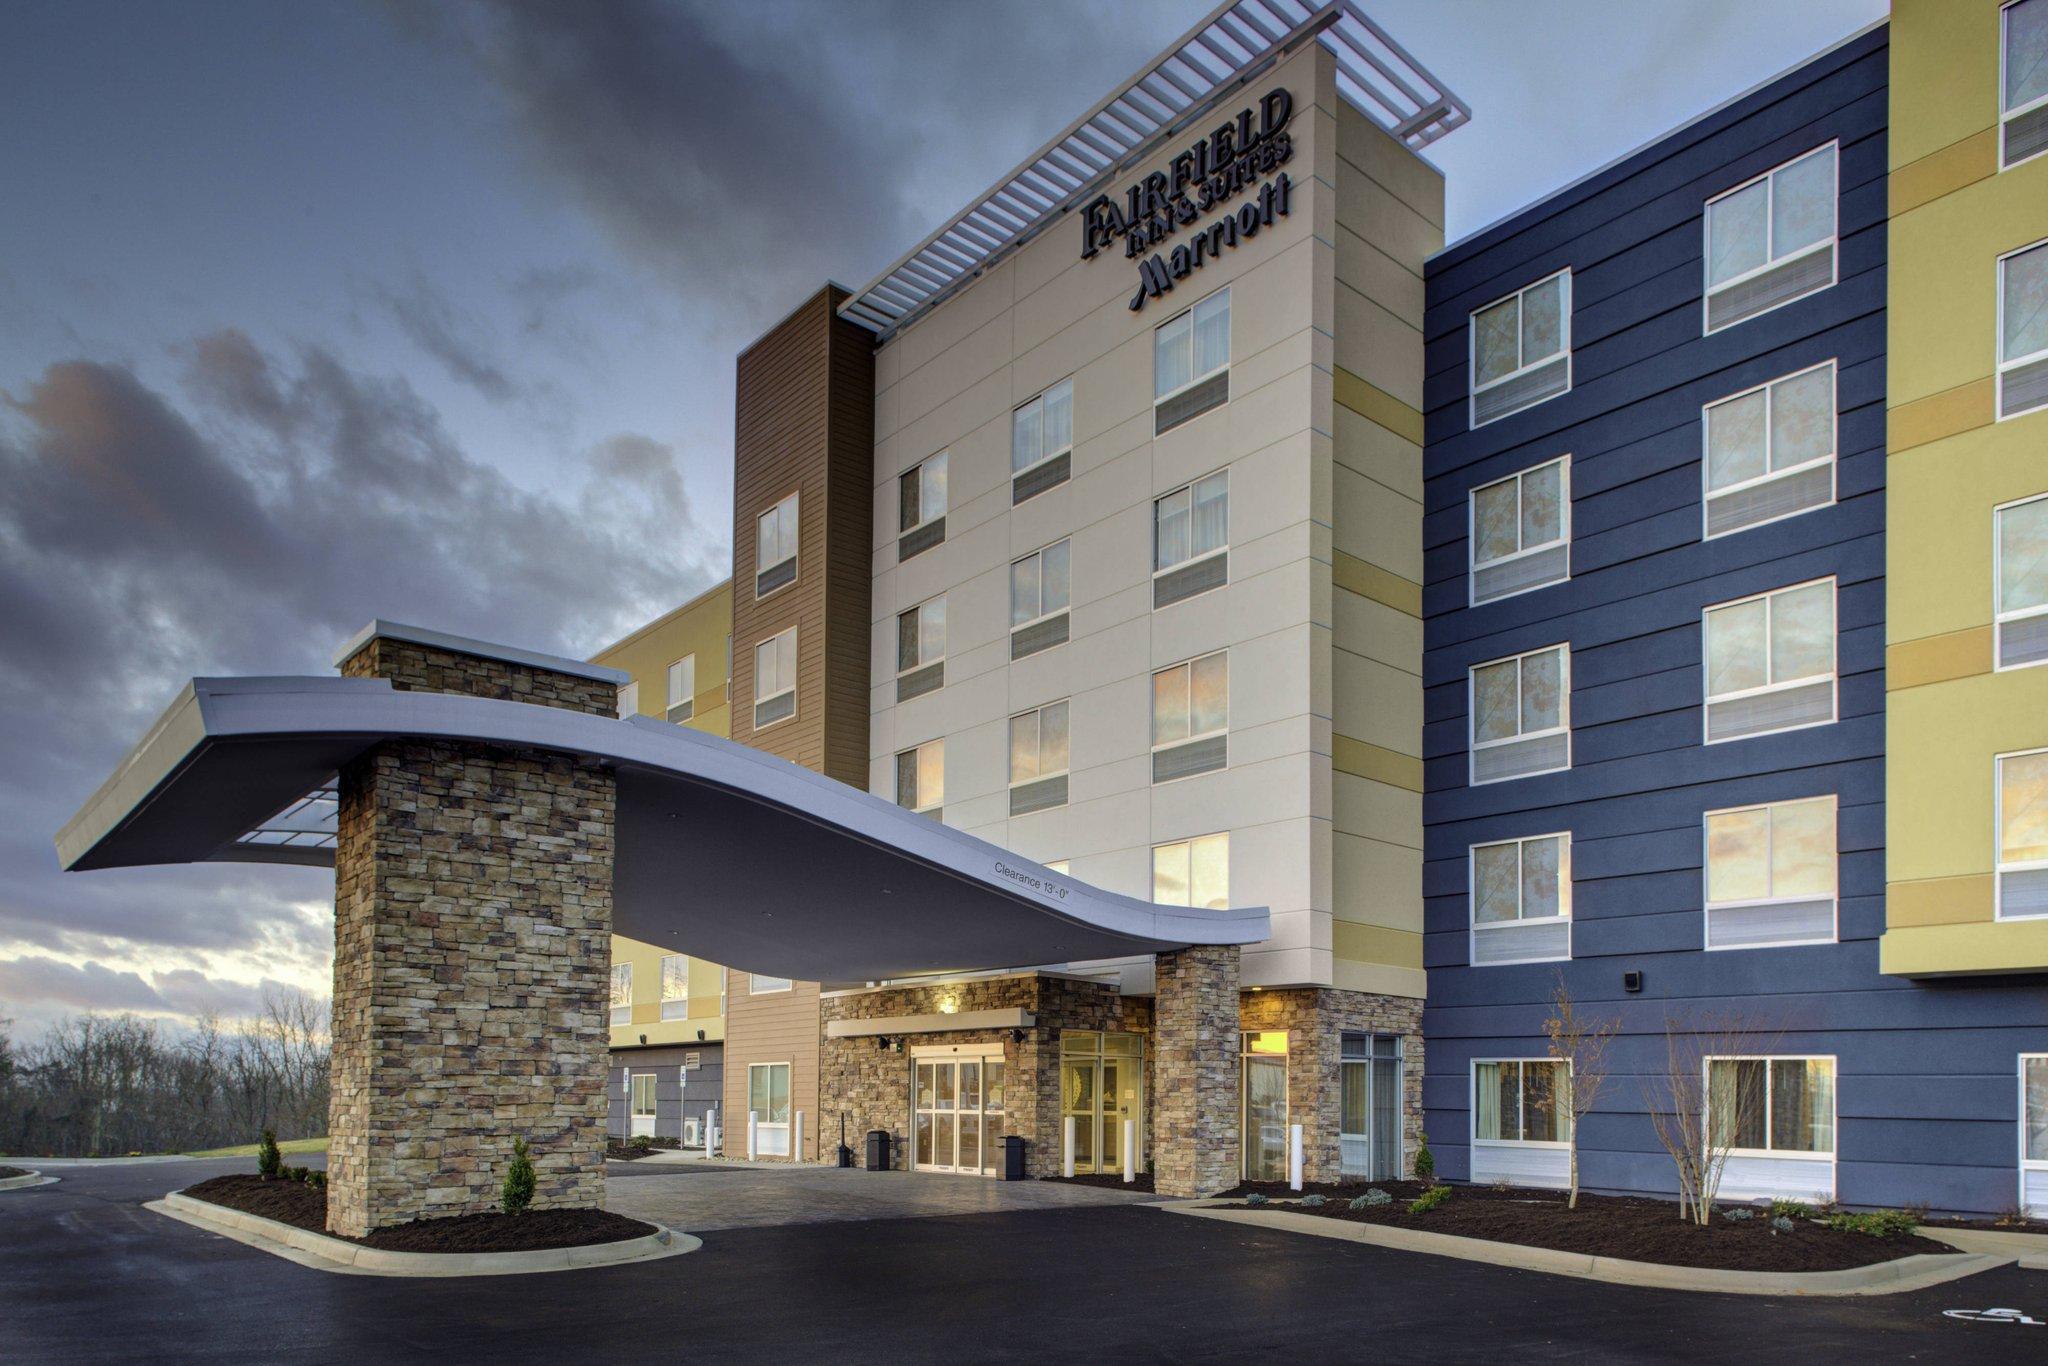 Fairfield Inn & Suites Roanoke Salem